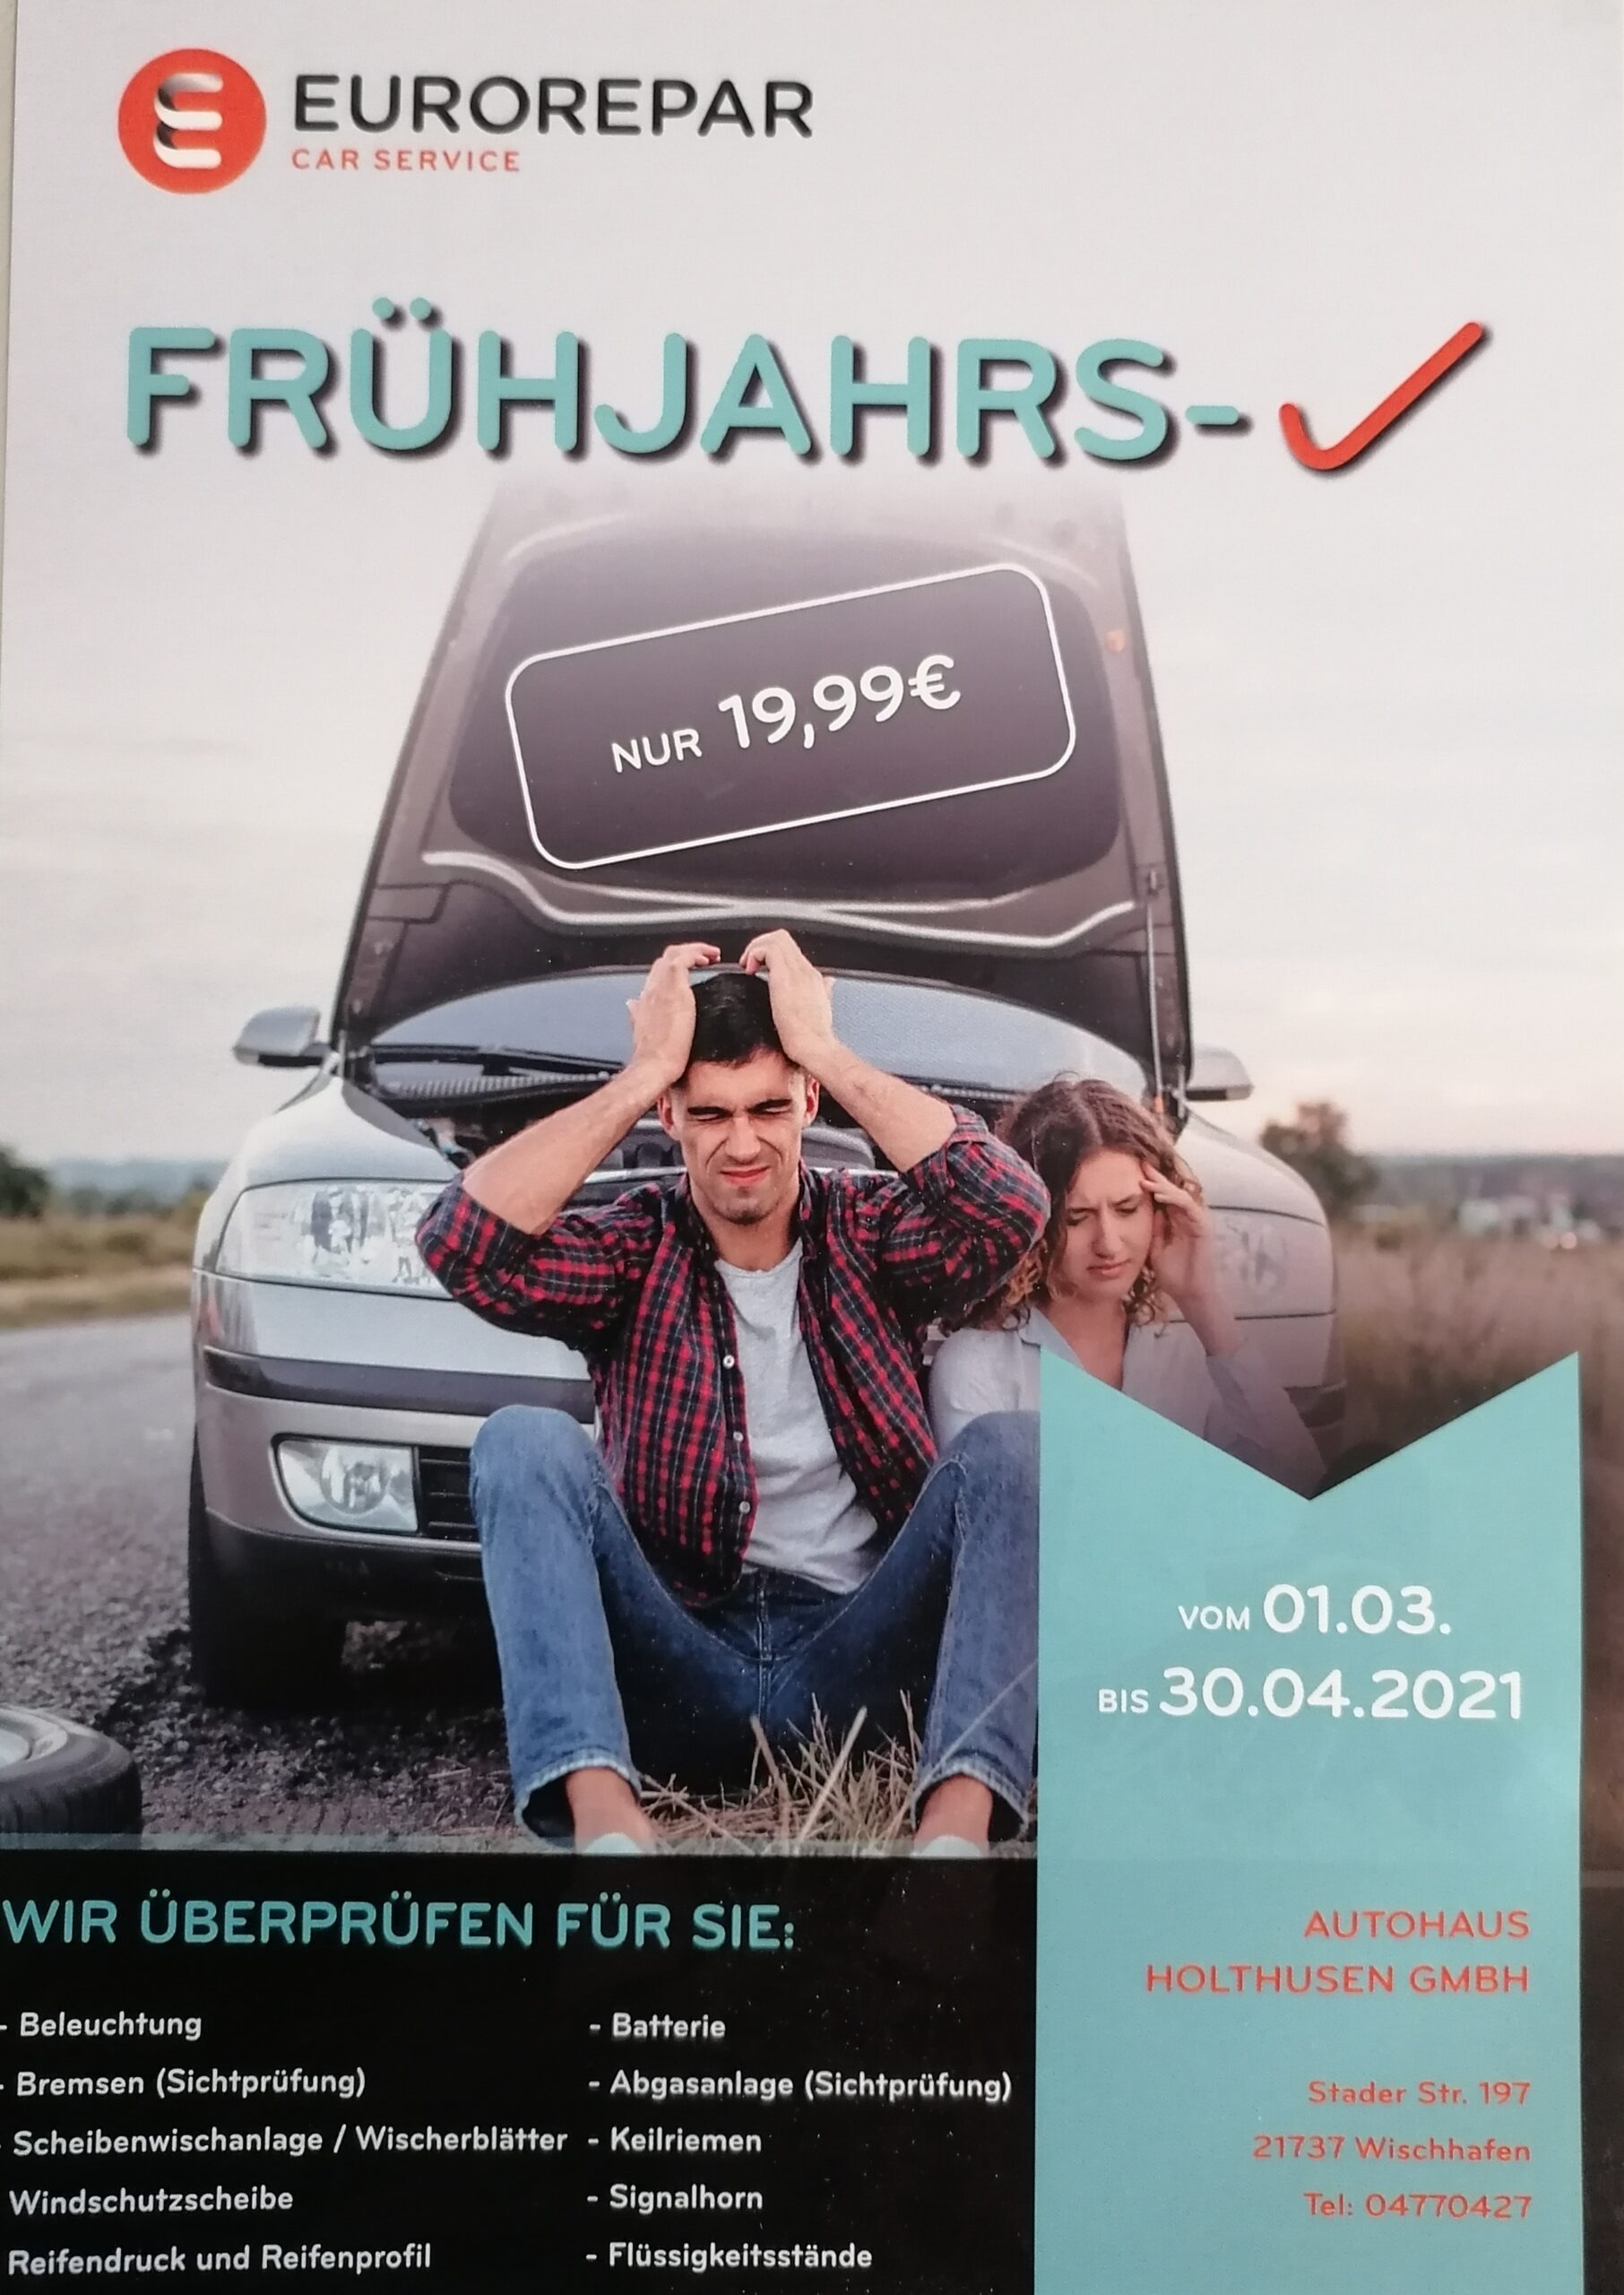 Eurorepar Fruhjars-Check